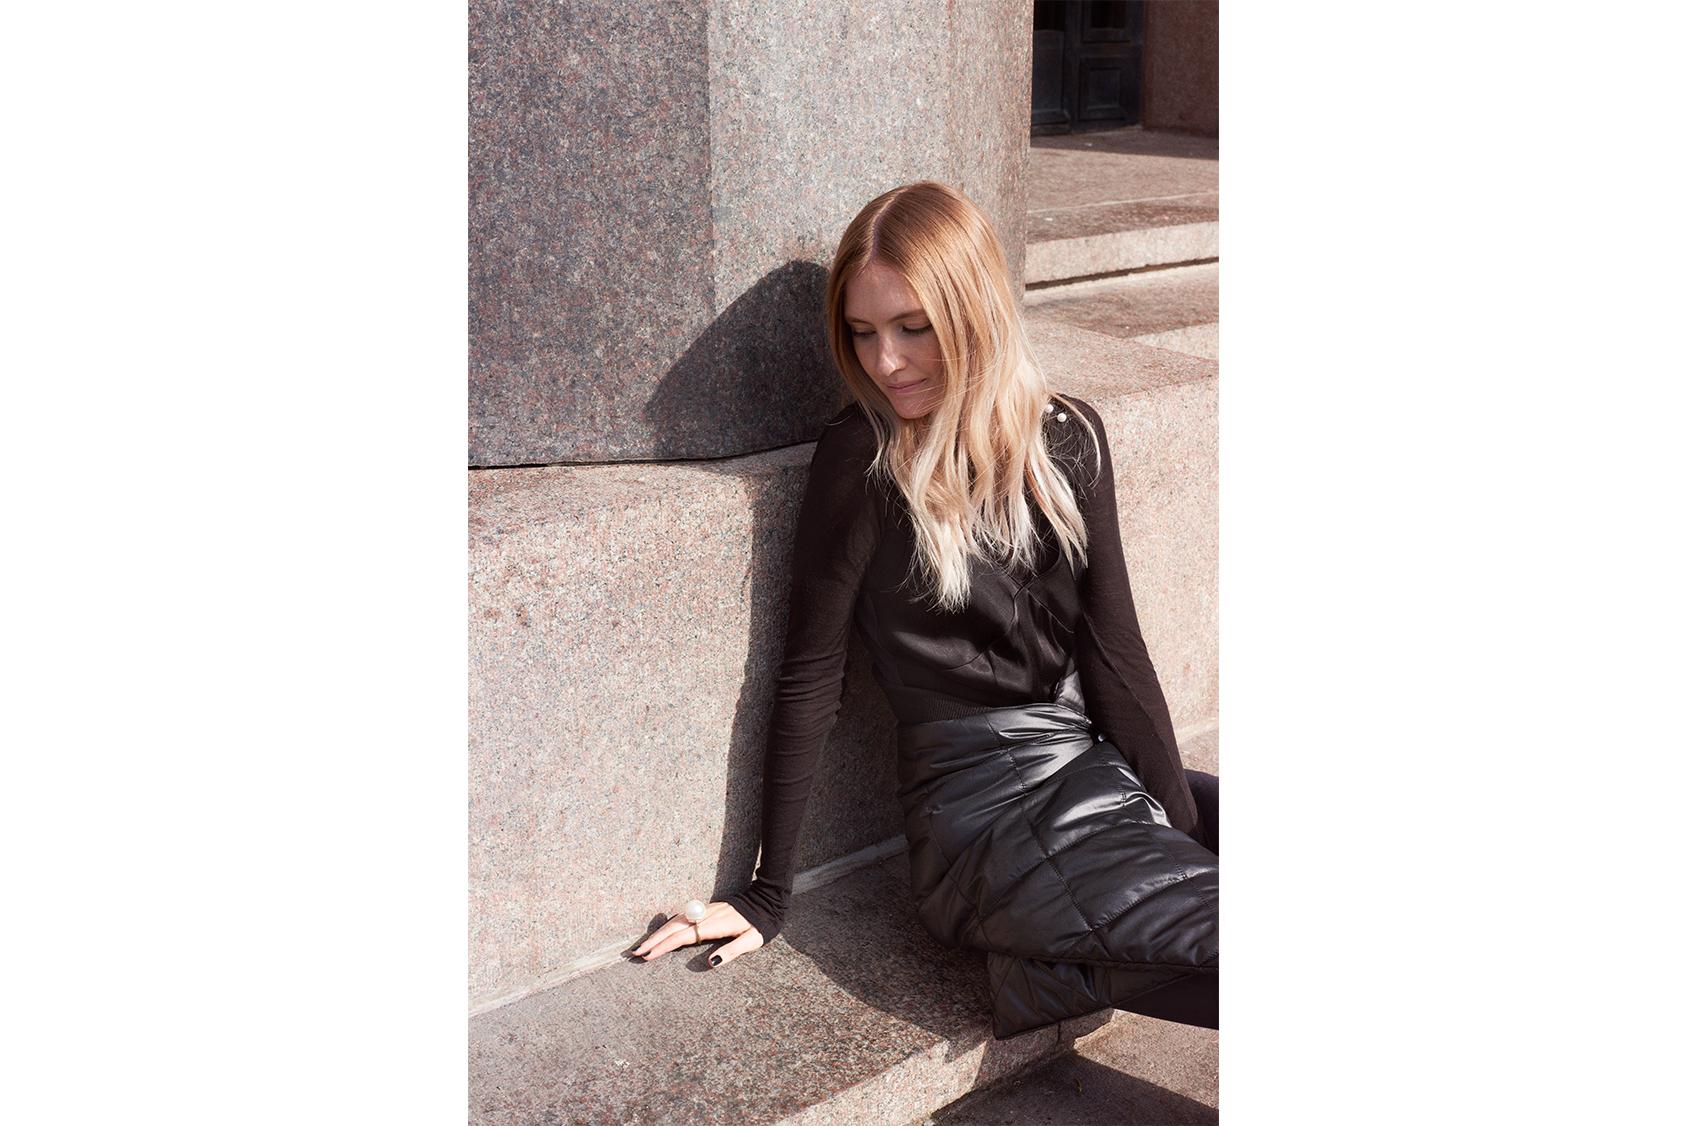 ELINA OLOFSSON, SWEDEN H&M